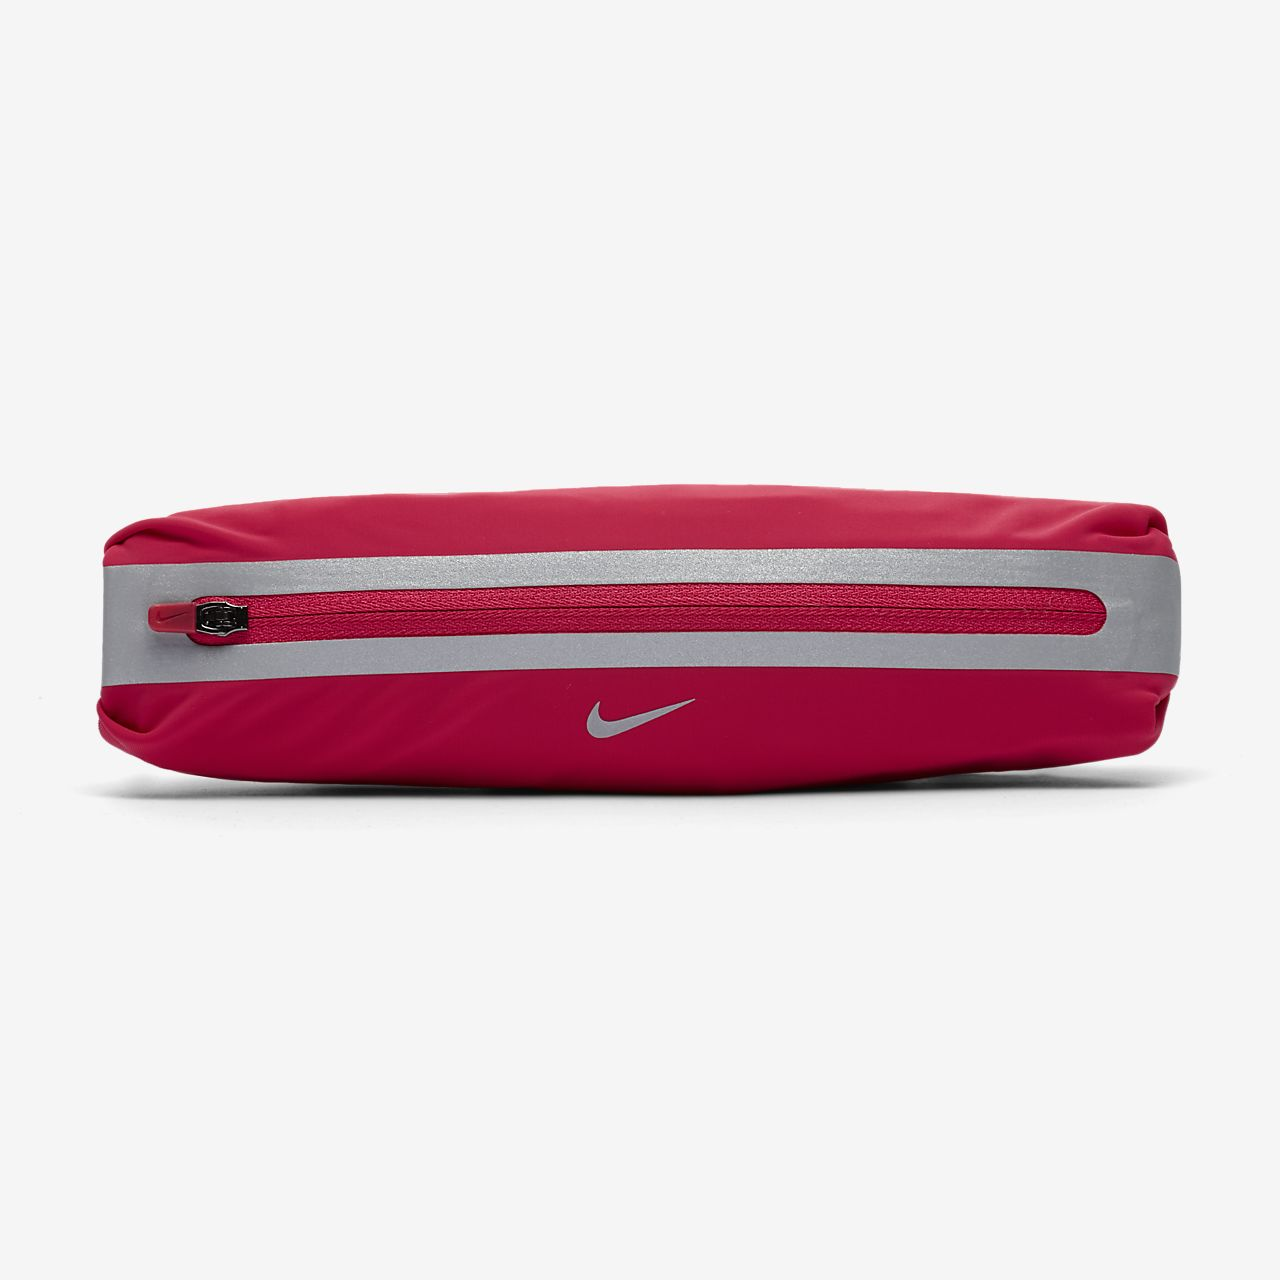 Wąska nerka Nike